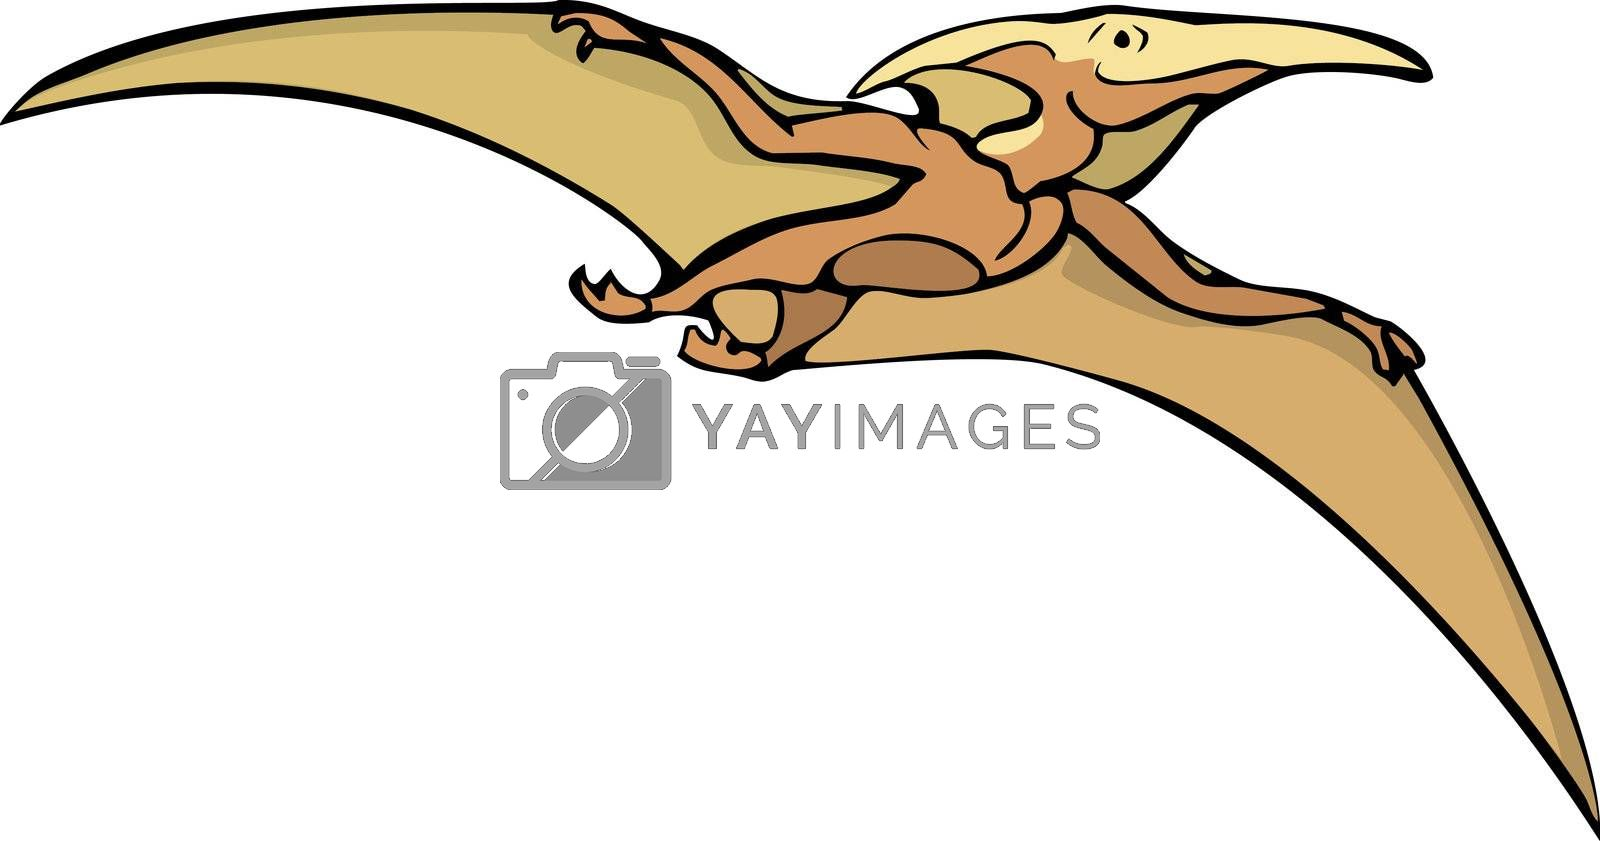 Pterodactyl #3 by Xochicalco